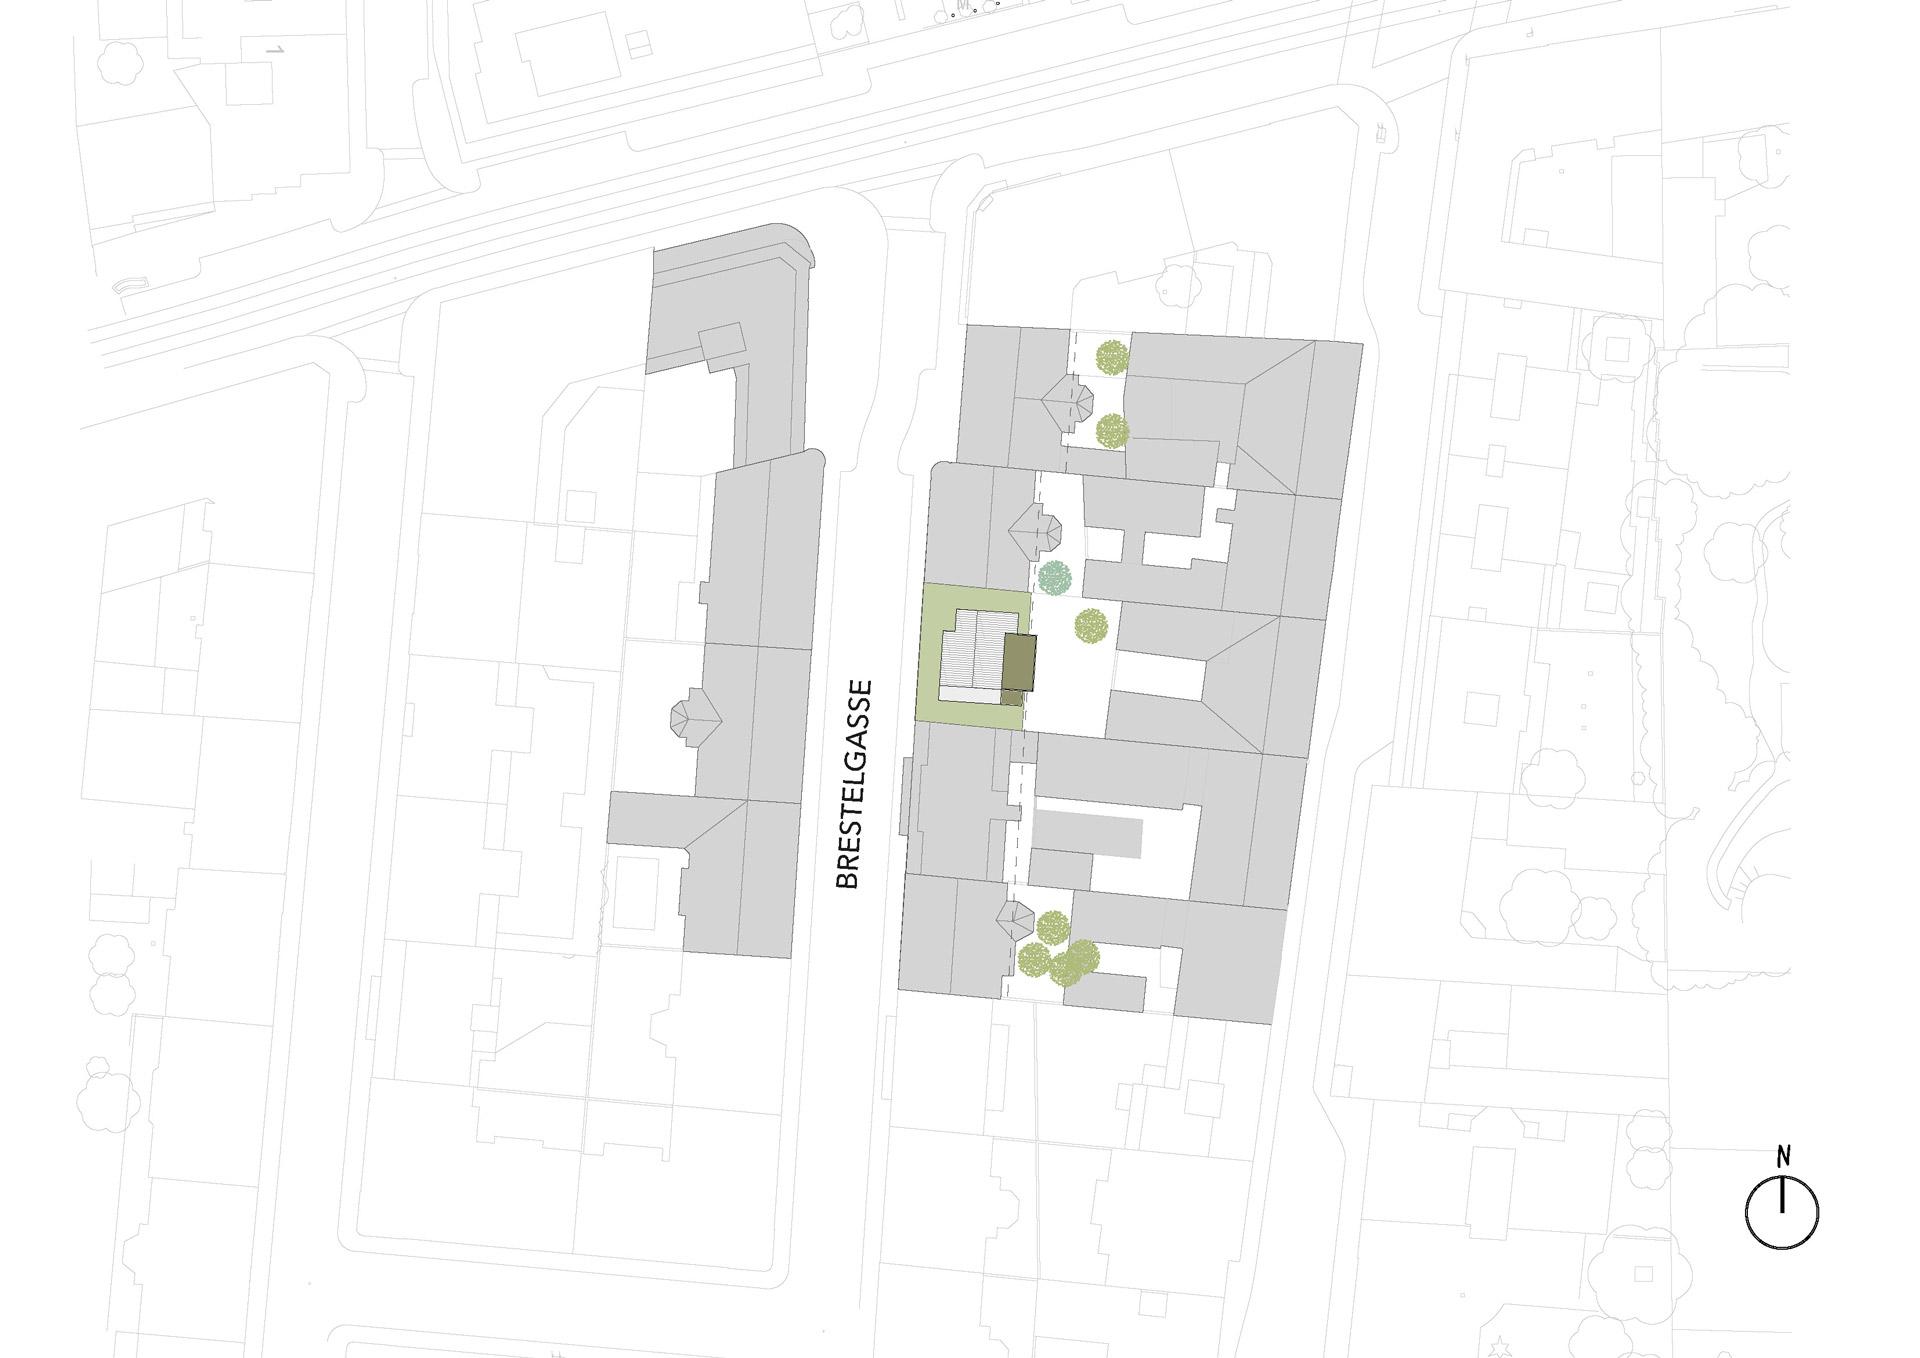 Urban Tree House Site Plan